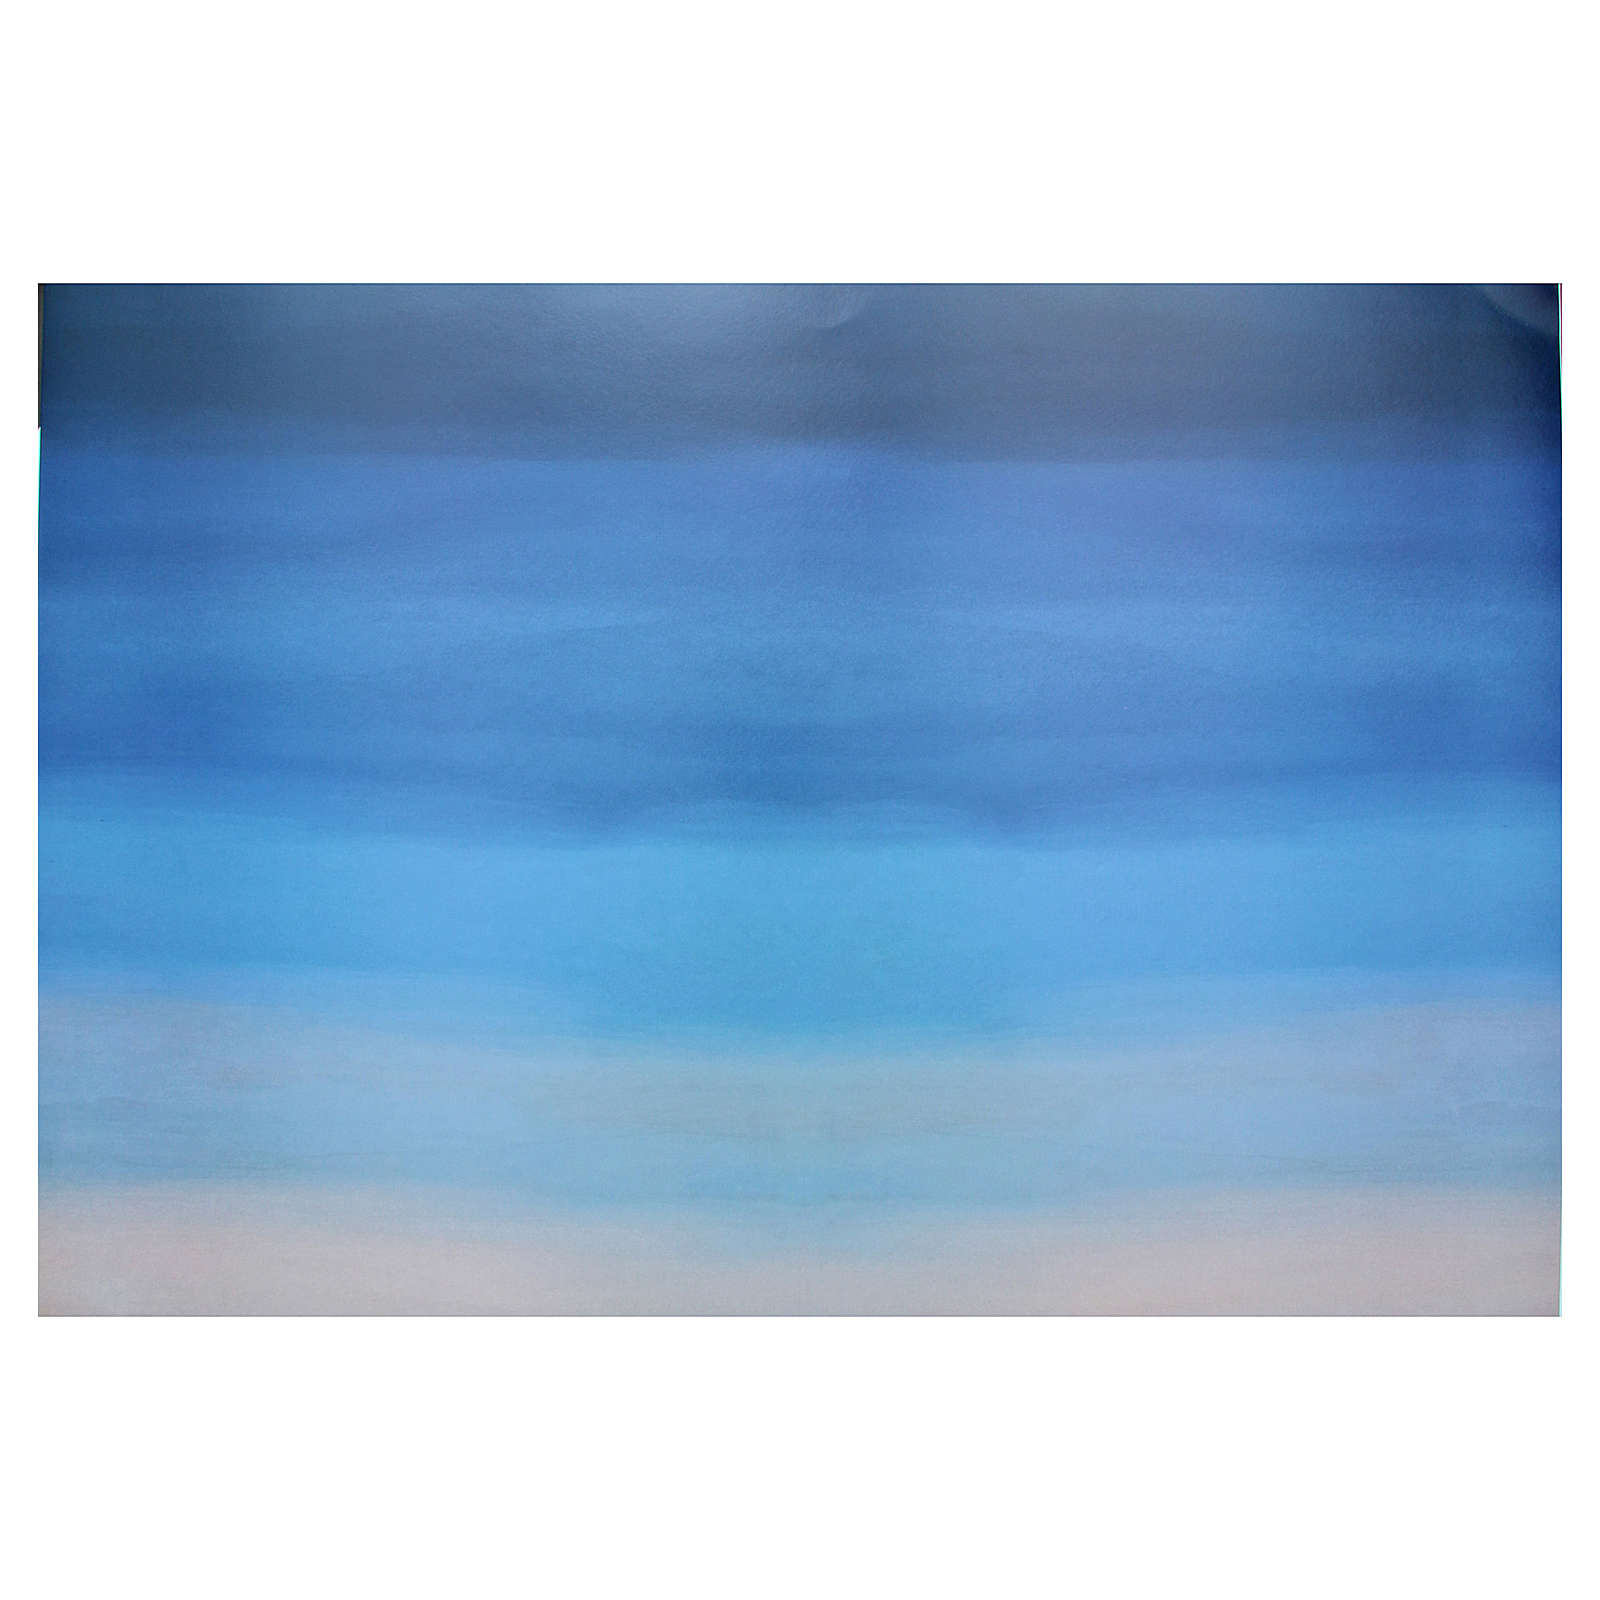 Fond de décor ciel carton 70x100 cm 4